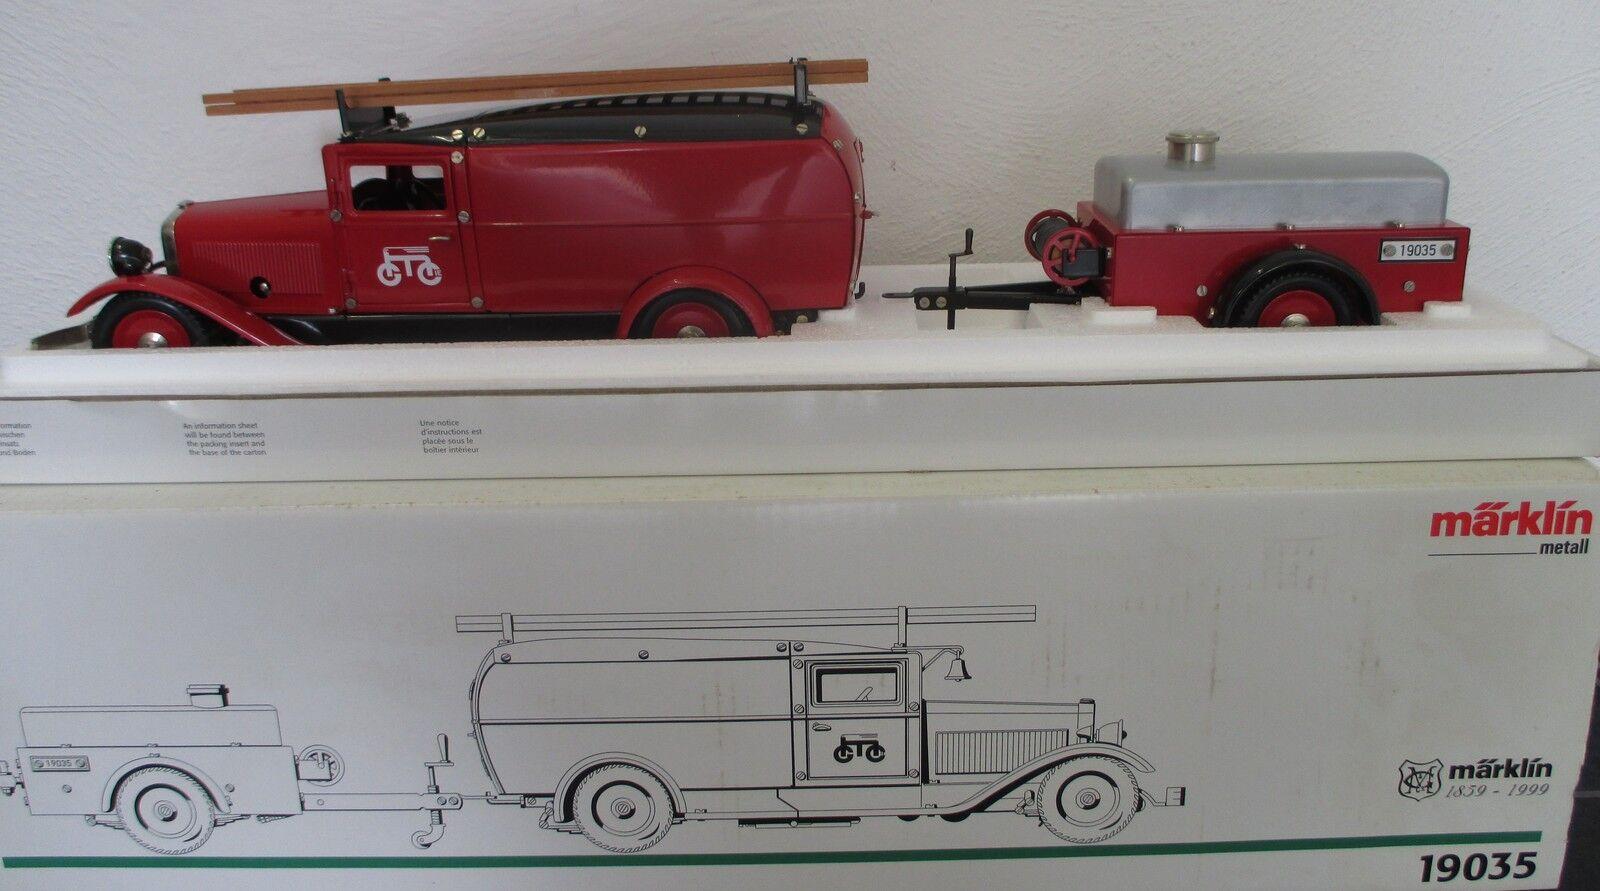 Märklin 19035 Coche a escala DE BOMBEROS Insider Modelo Condición Nuevo Limitado